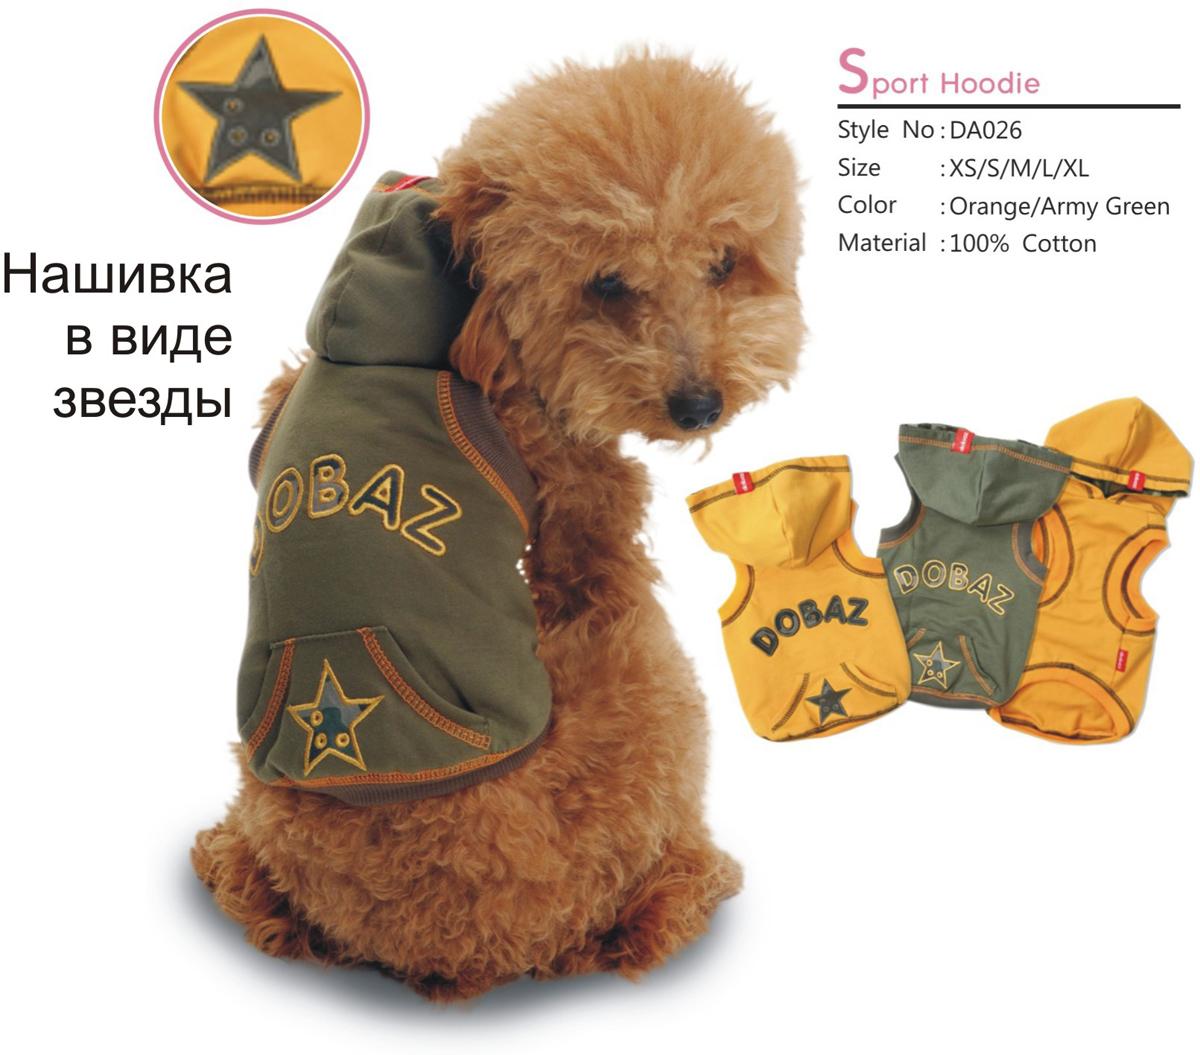 "Майка для собак ""Dobaz"", унисекс, цвет: хаки. ДА026БХЛ. Размер XL"